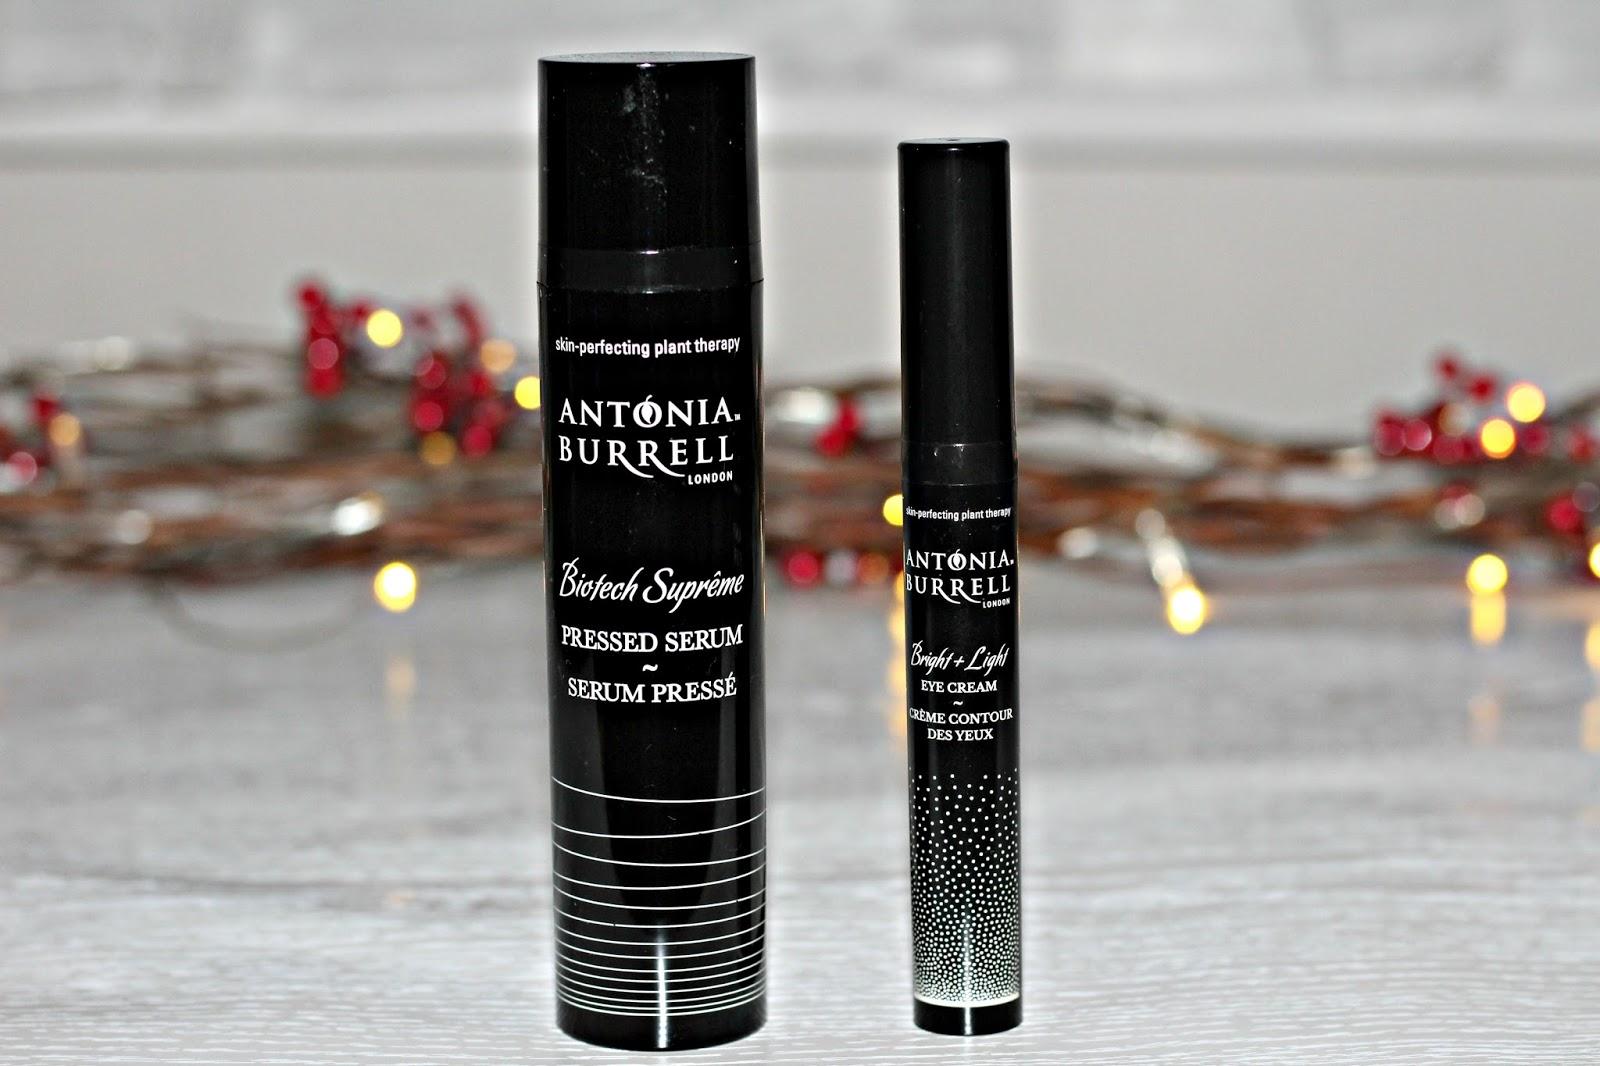 Antonia Burrell: Biotech Pressed serum and Bright and light eye cream review